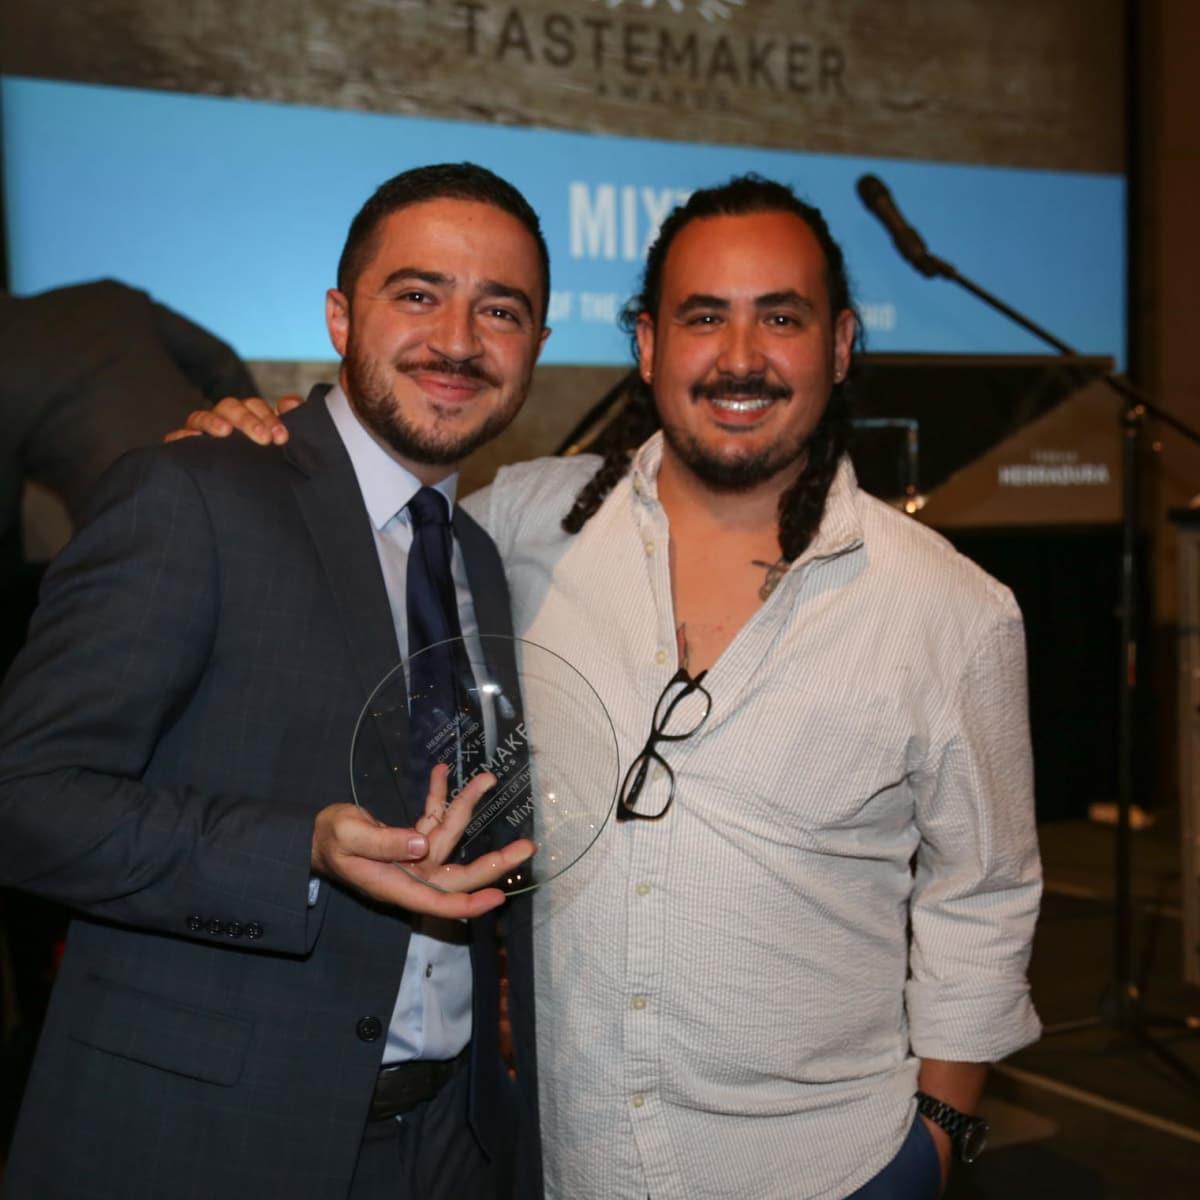 CultureMap Tastemaker Awards 2016 at Bob Bullock Museum